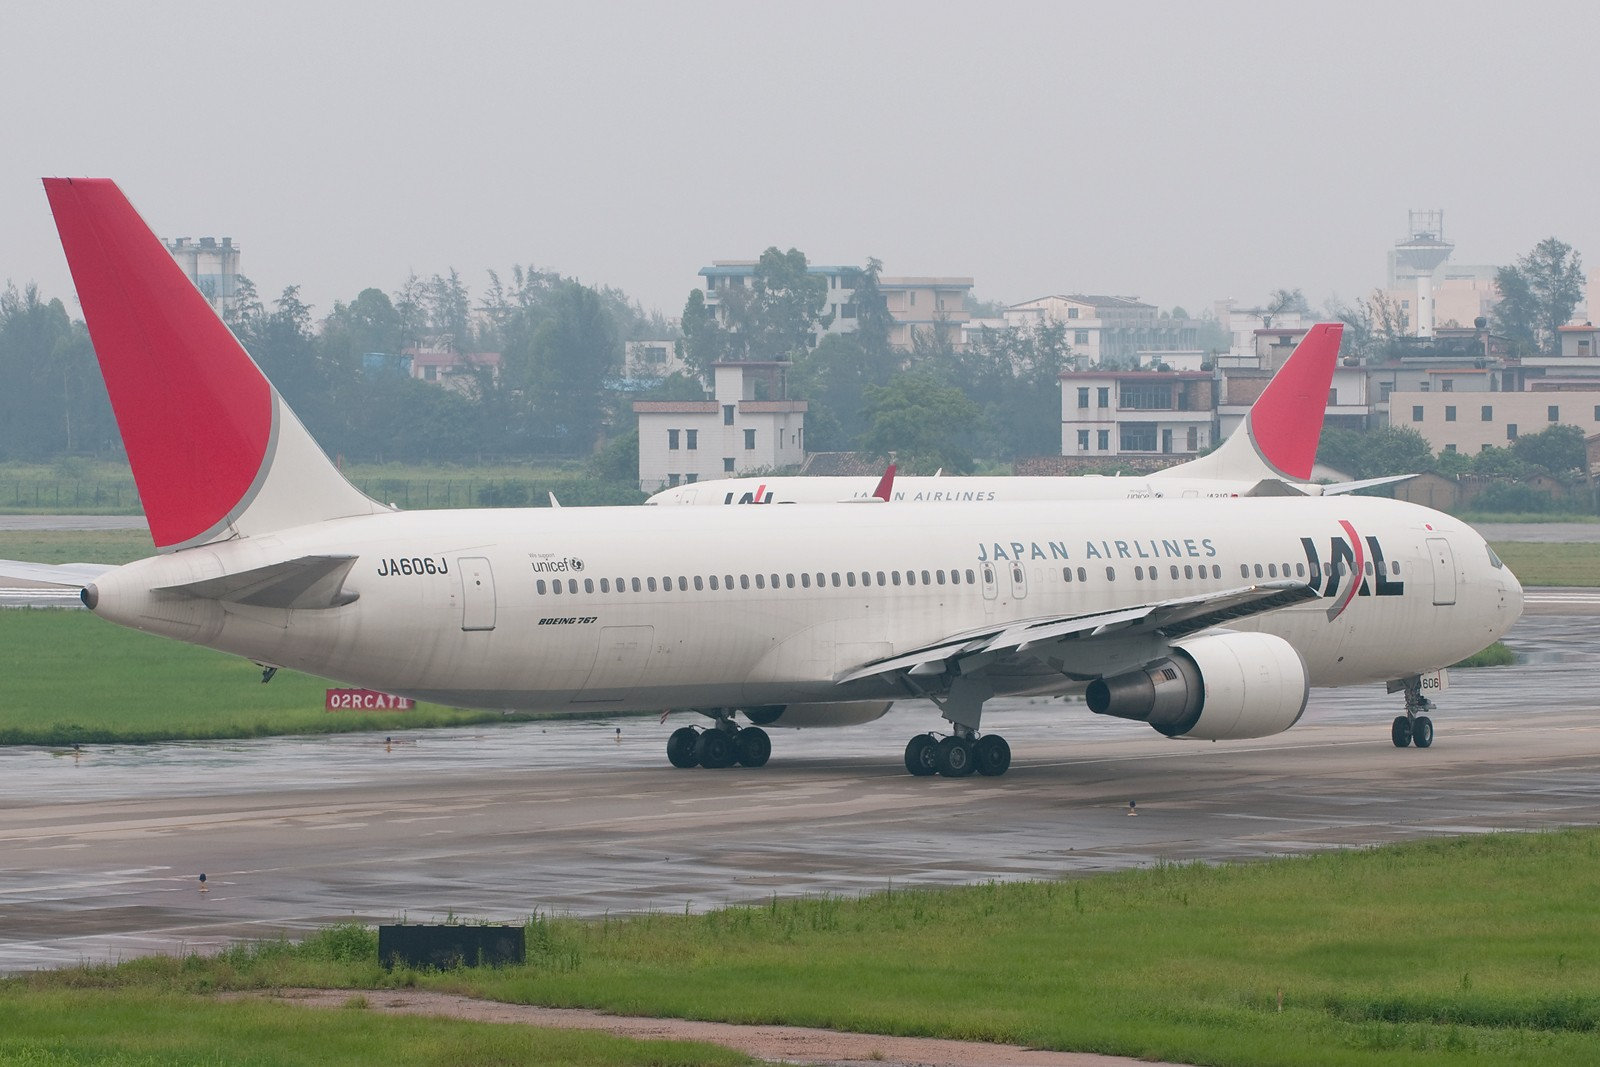 Re:[原创][CASG]暴雨又来了 BOEING 767 JA606J 中国广州白云机场